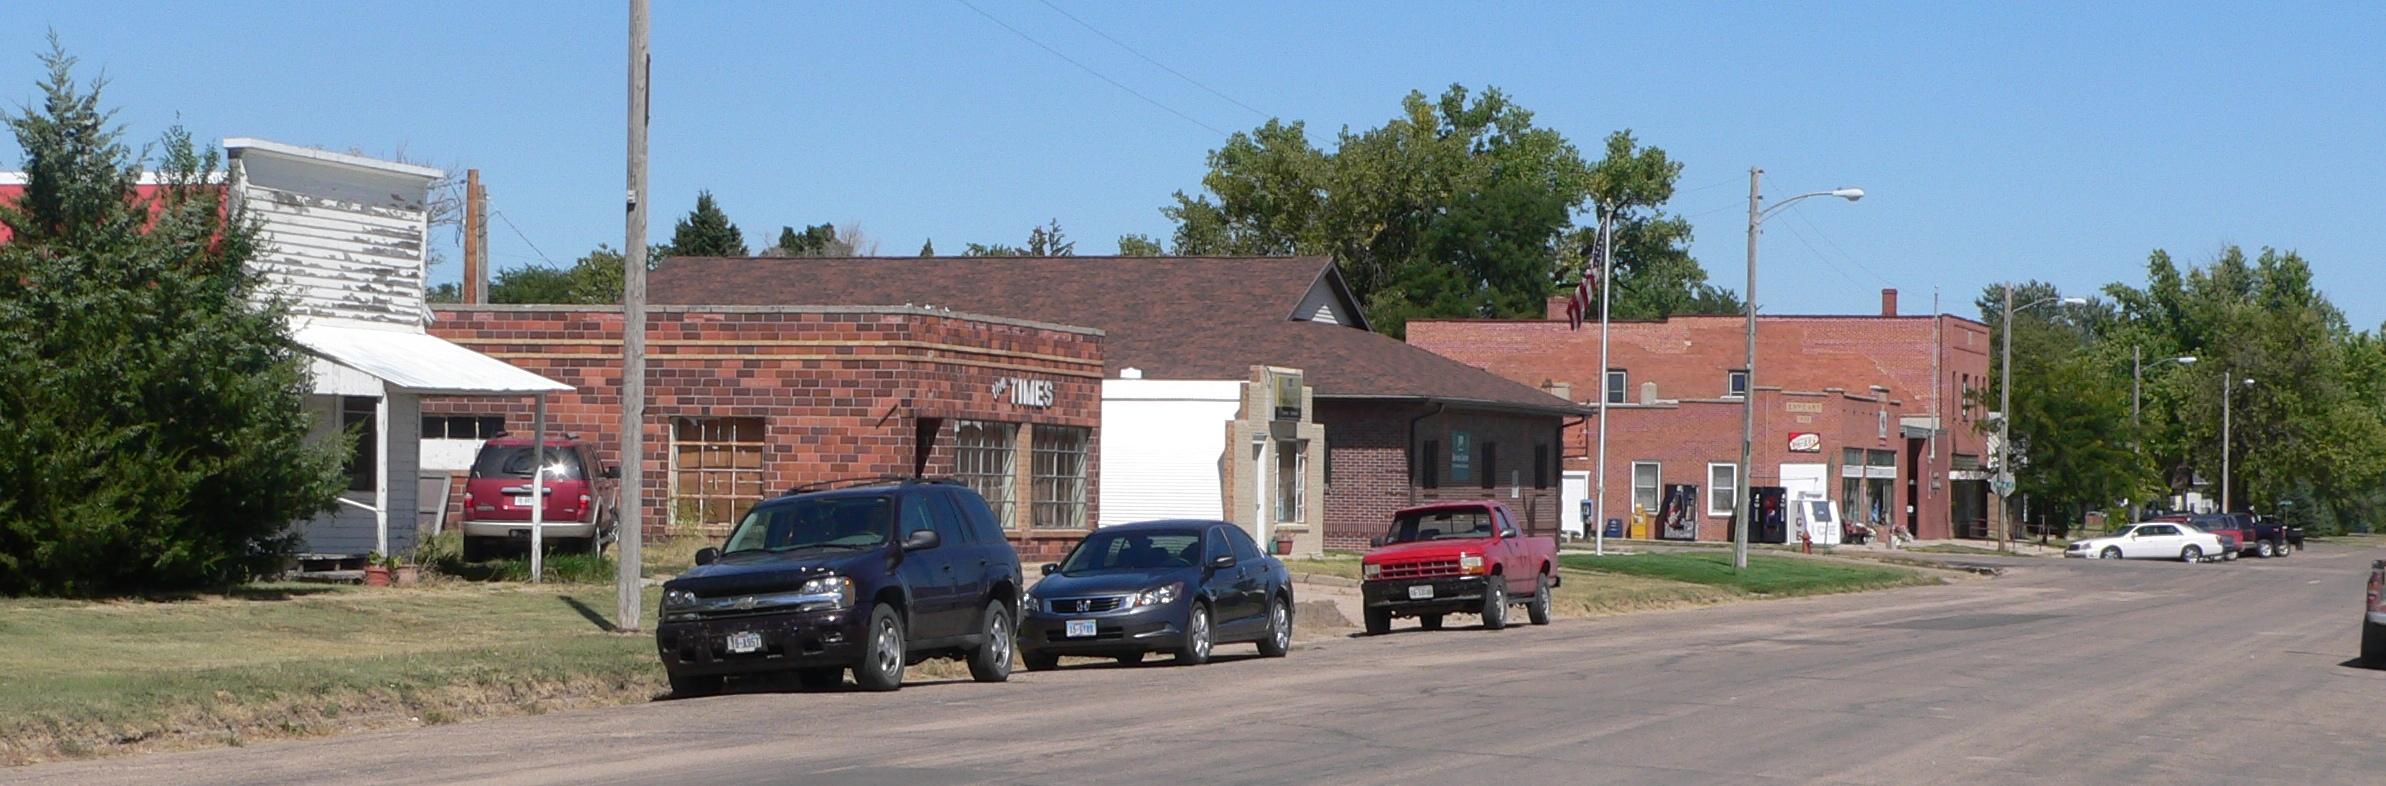 File:Hayes Center, Nebraska Tate Street 1.JPG - Wikimedia ...